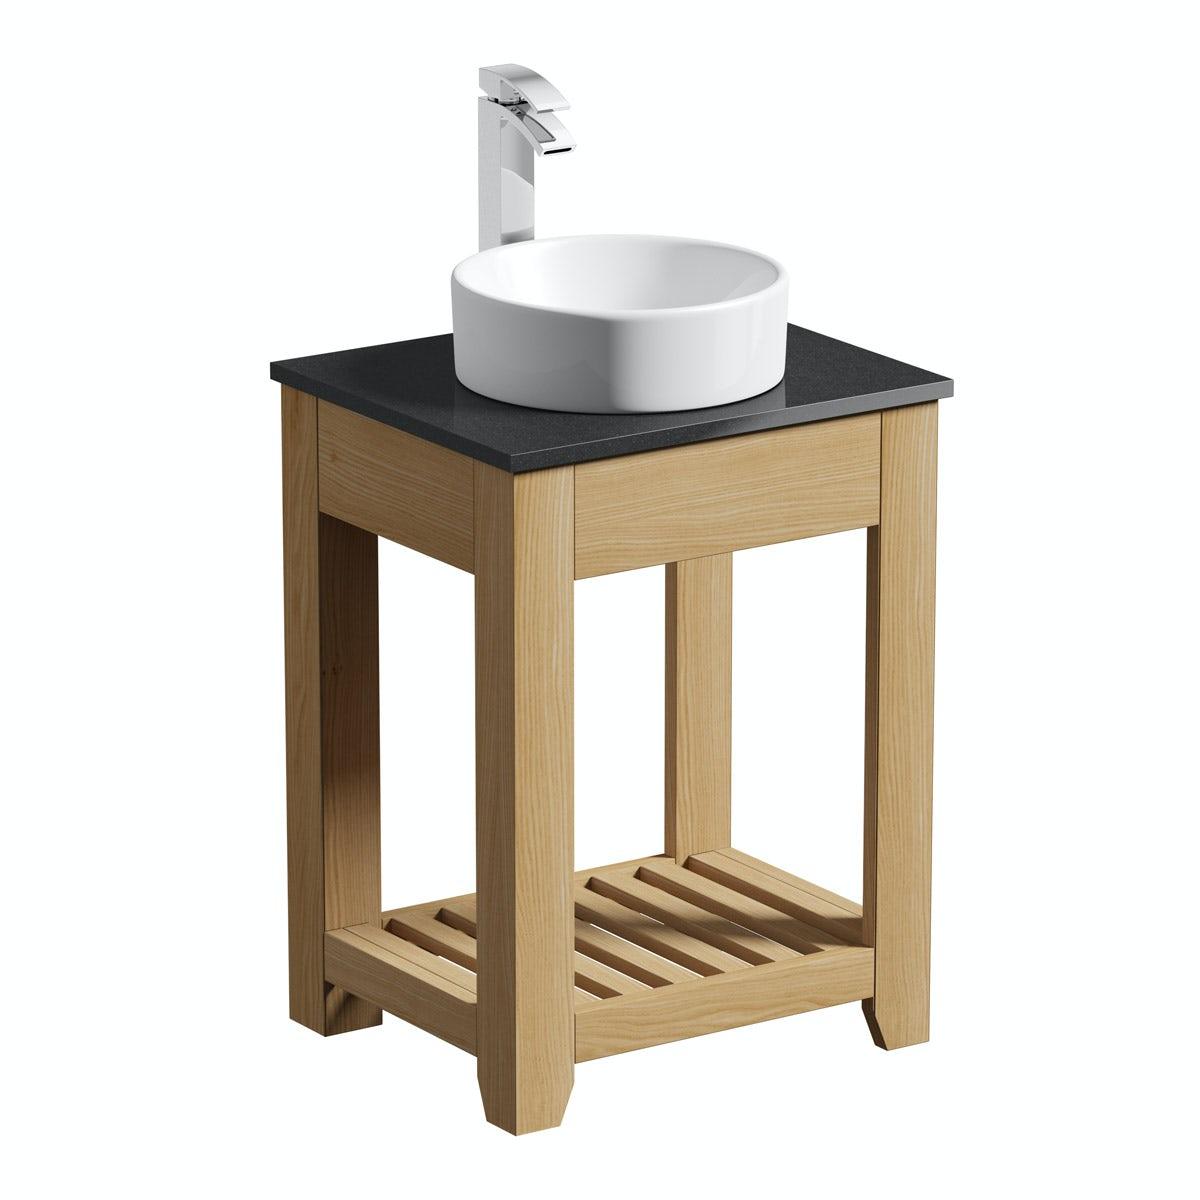 The Bath Co. Hoxton oak washstand with black marble top and Calhoun basin 600mm